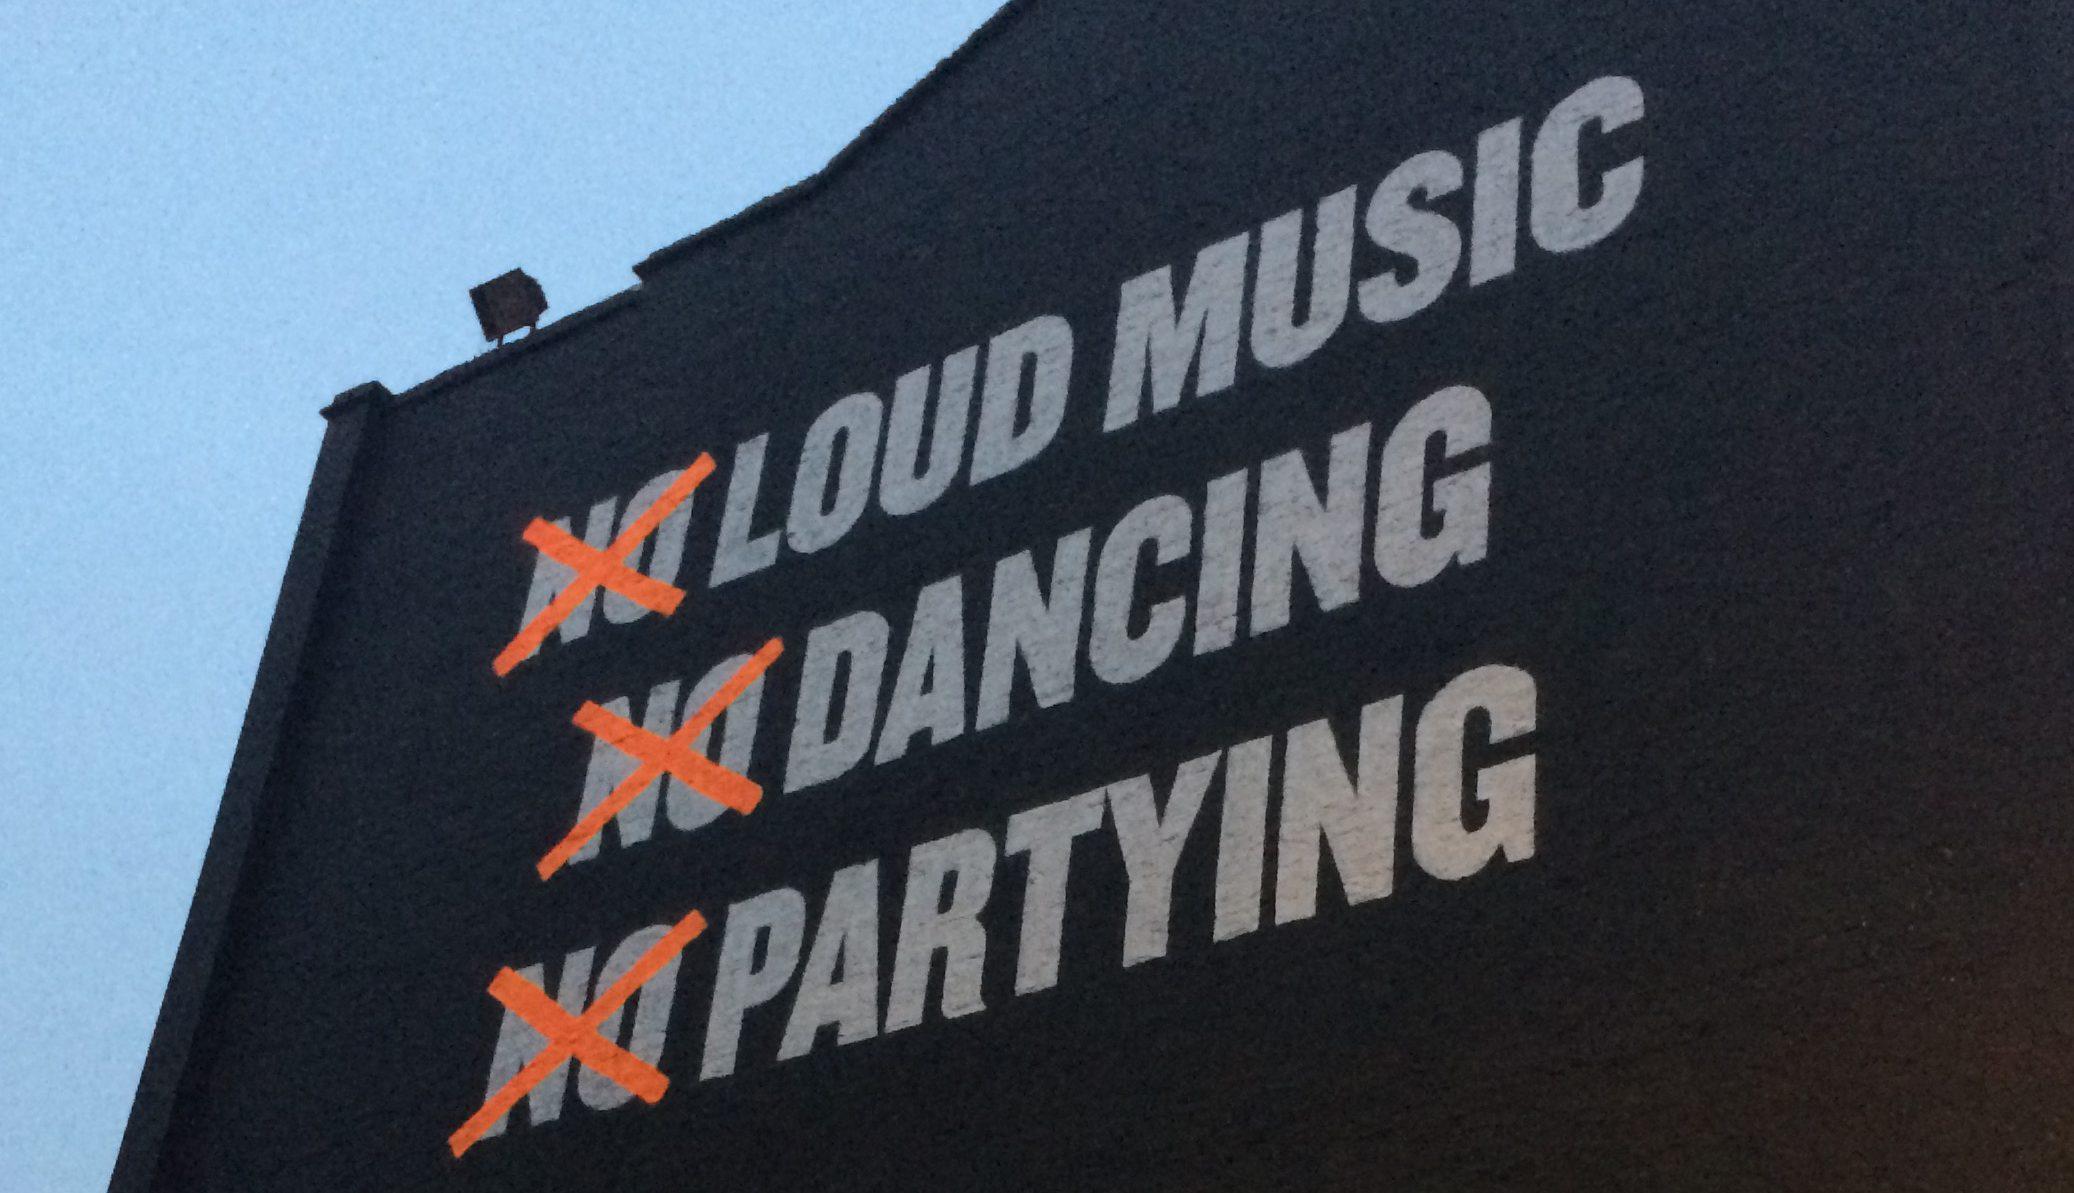 Loud Music Dancing Partying in London